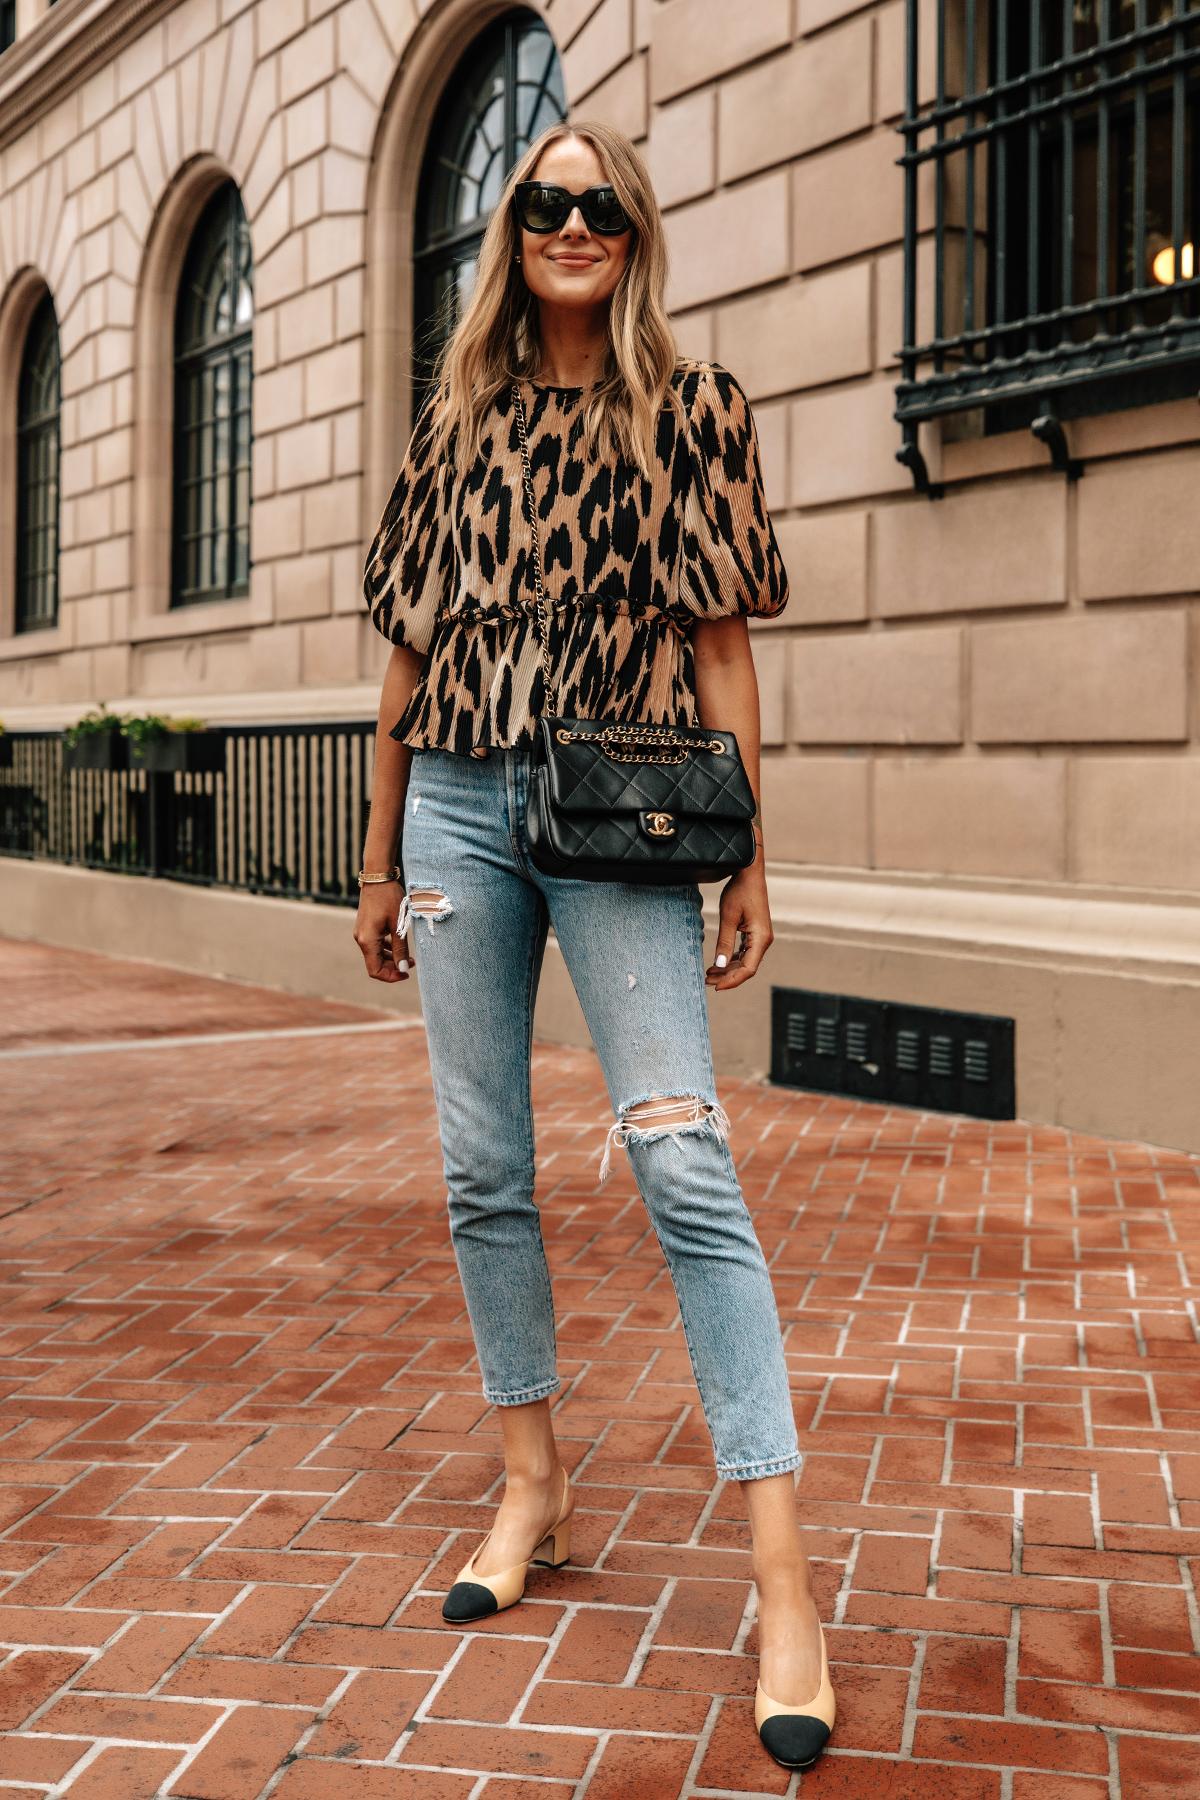 Fashion Jackson Wearing Ganni Leopard Top Levis Ripped Jeans Chanel Slingbacks Black Chanel Handbag Street Style